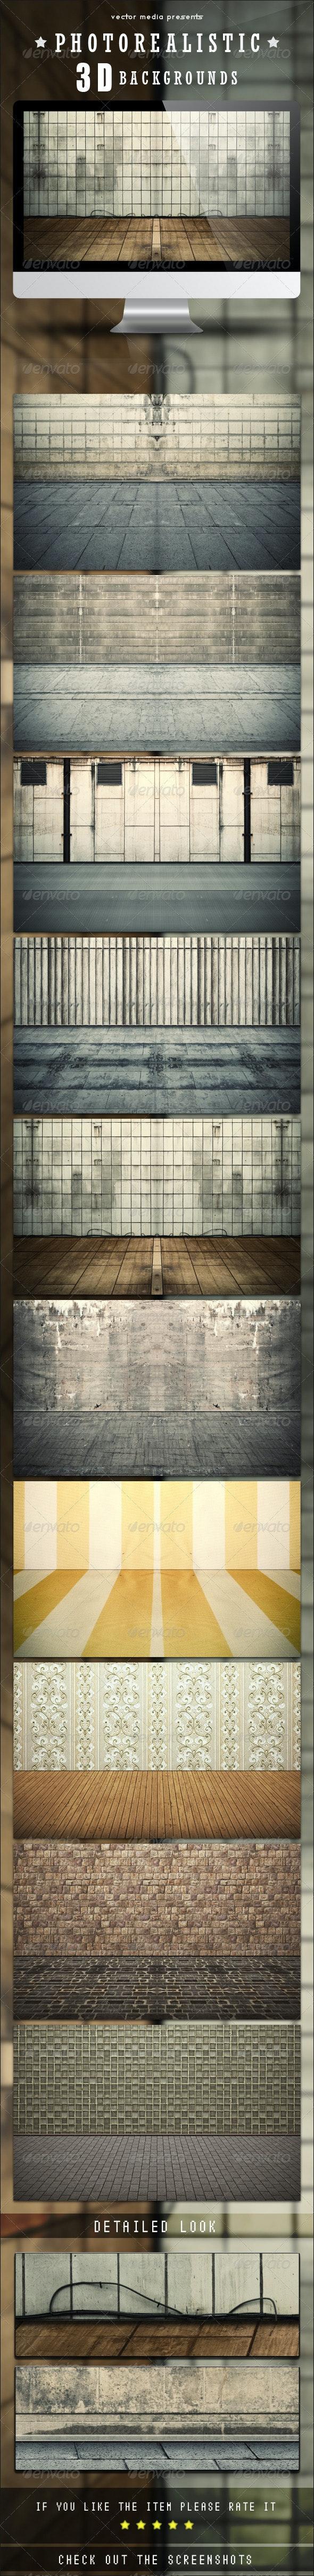 Photorealistic 3D Backgrounds - 3D Backgrounds